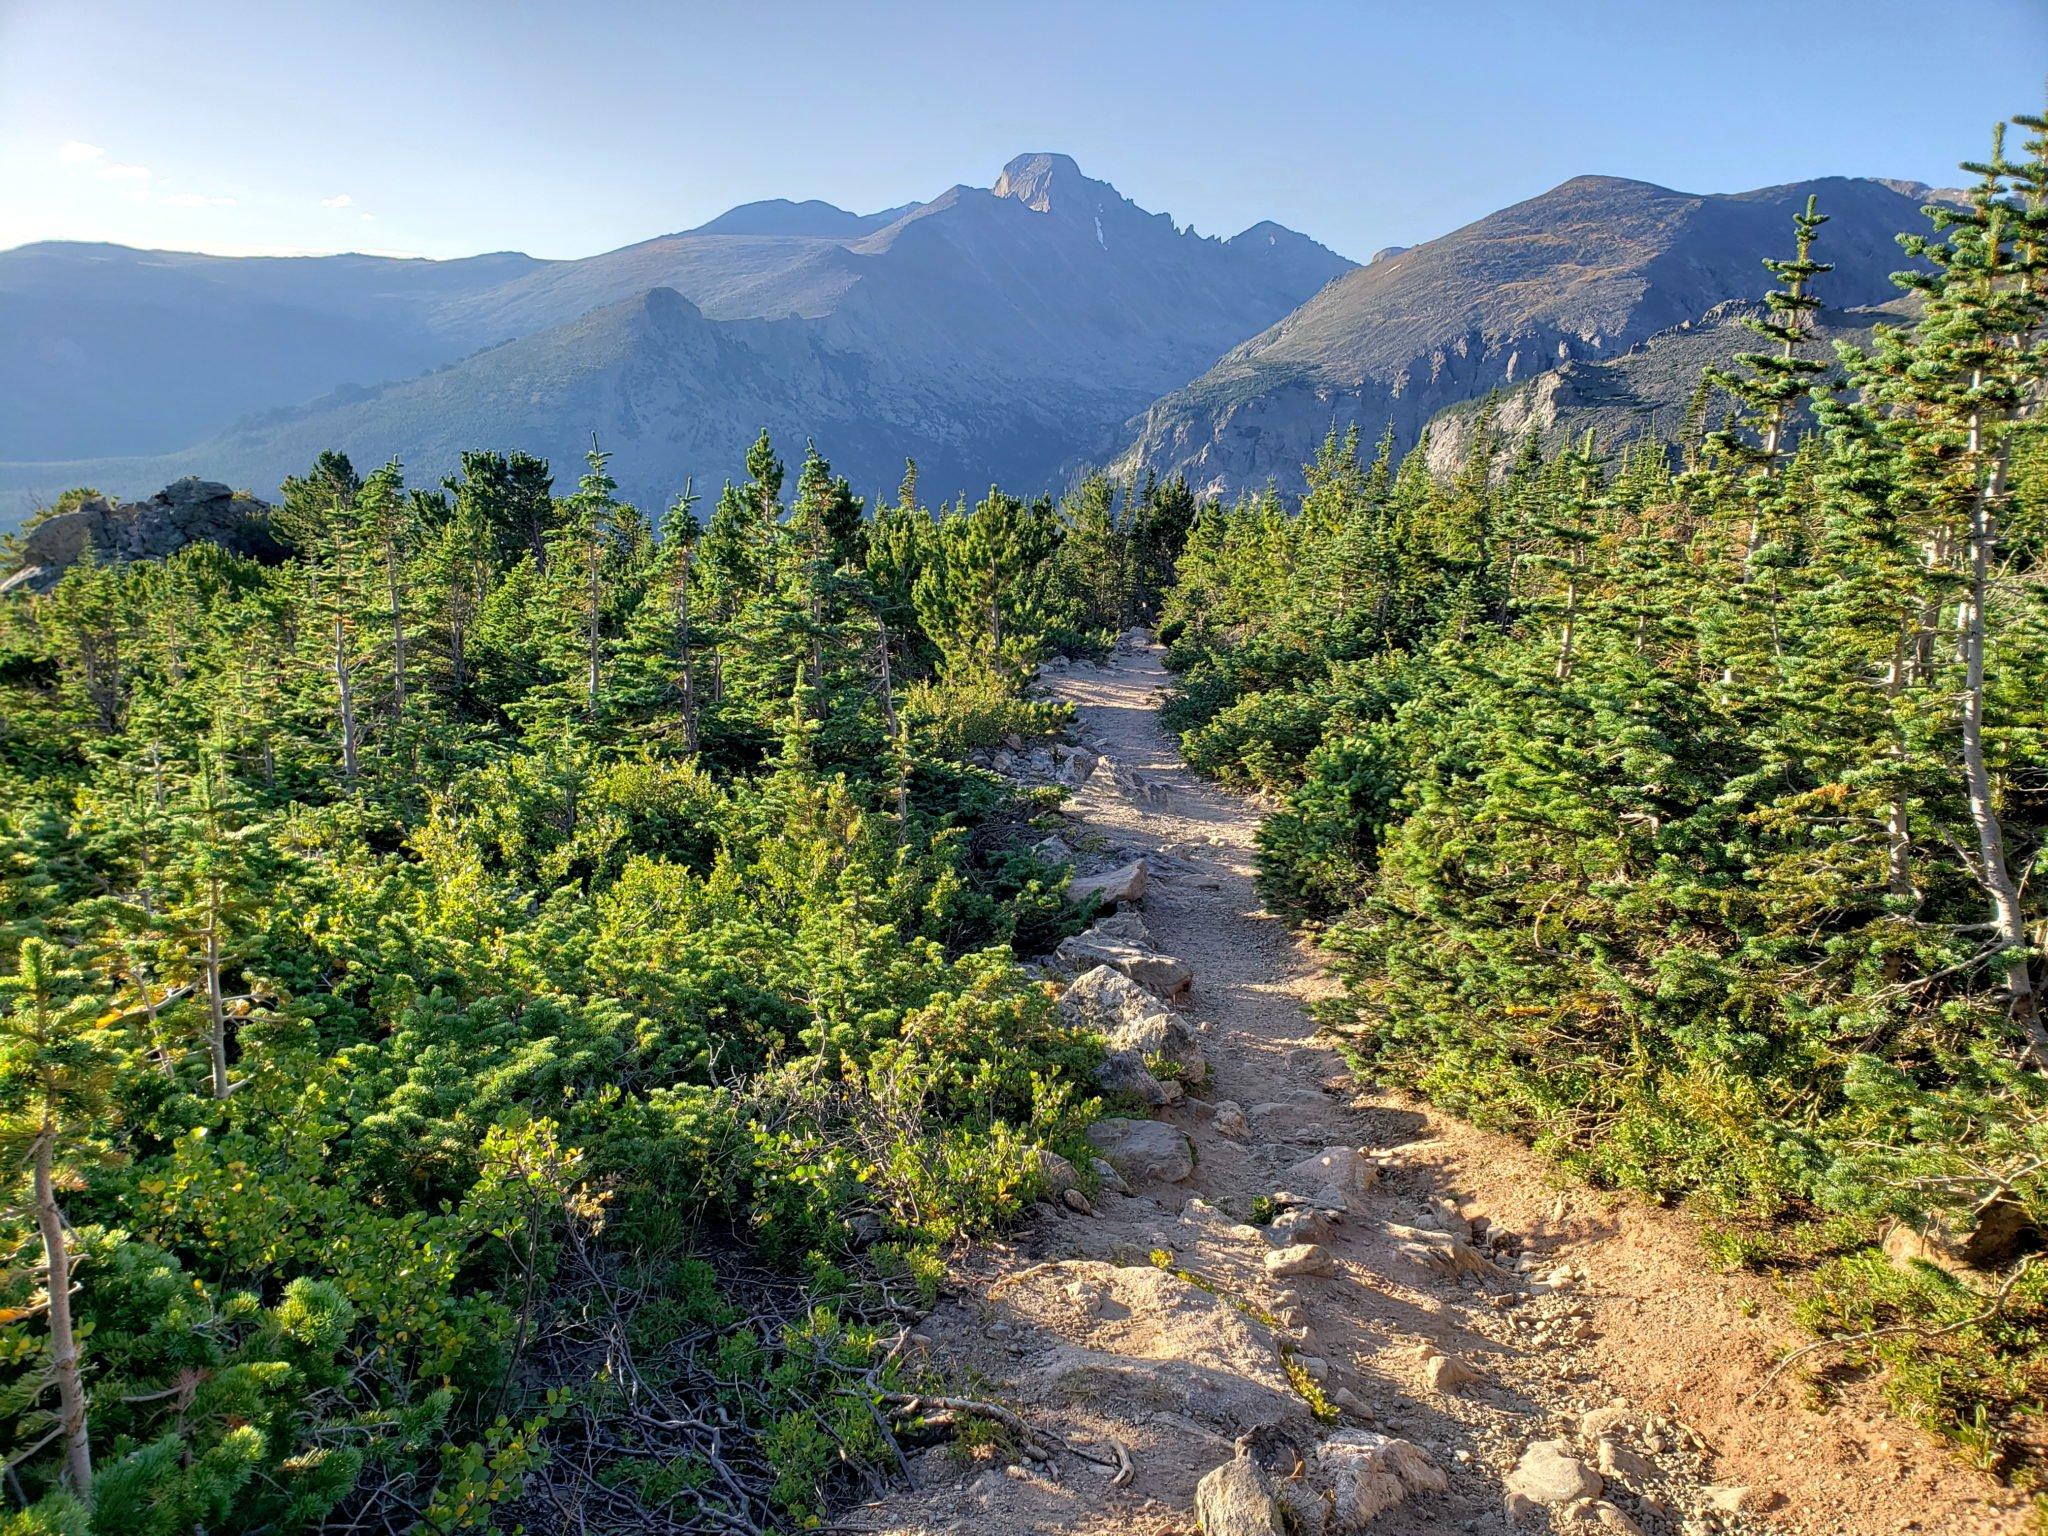 Near treeline along the Flattop Mountain trail